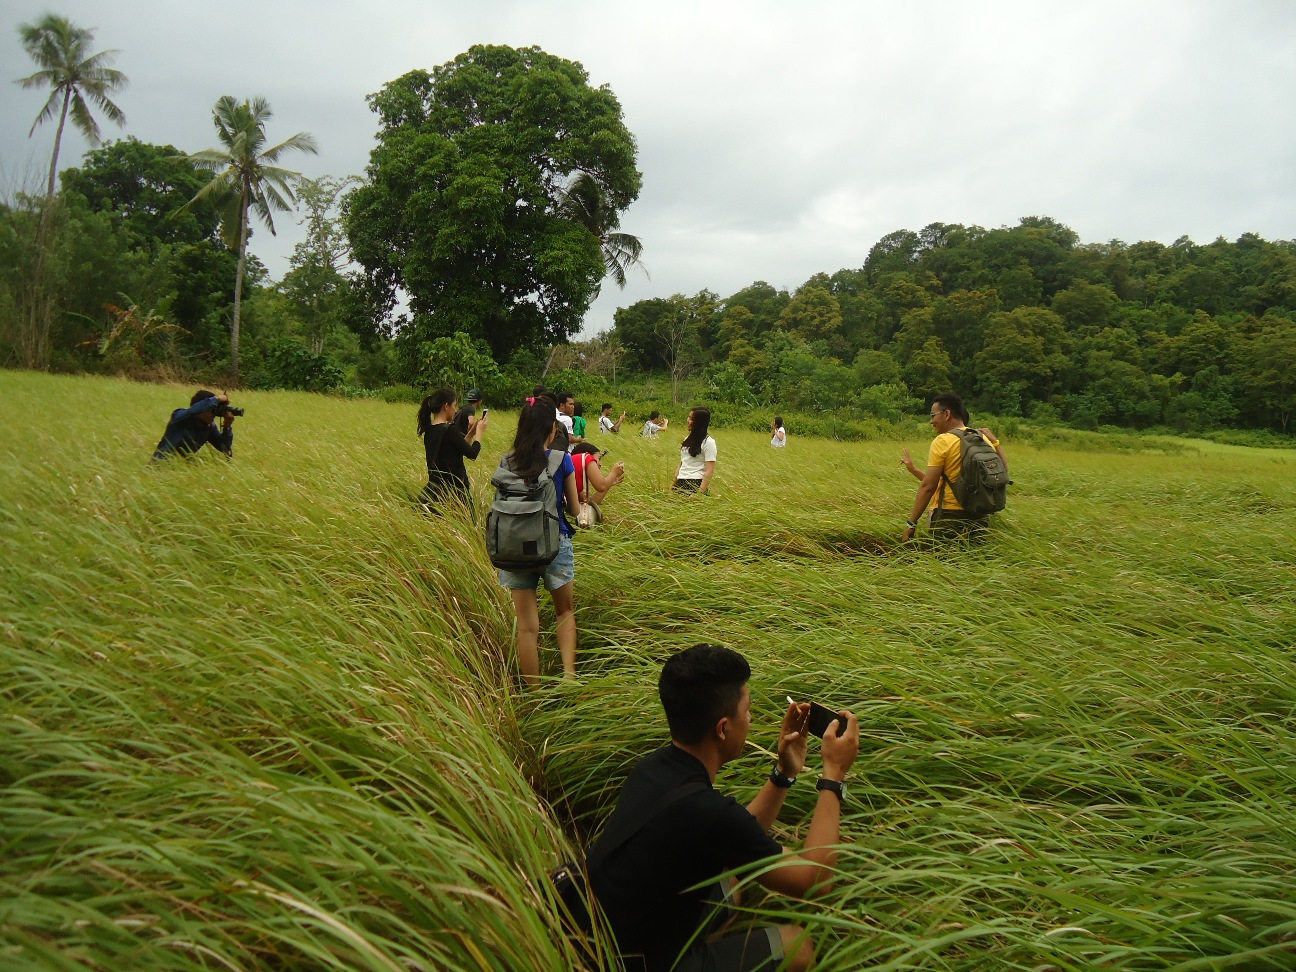 Desa Wisata Bahari Tumbak Posumaen Minahasa Tenggara Sulawesi Utara Wisatawan